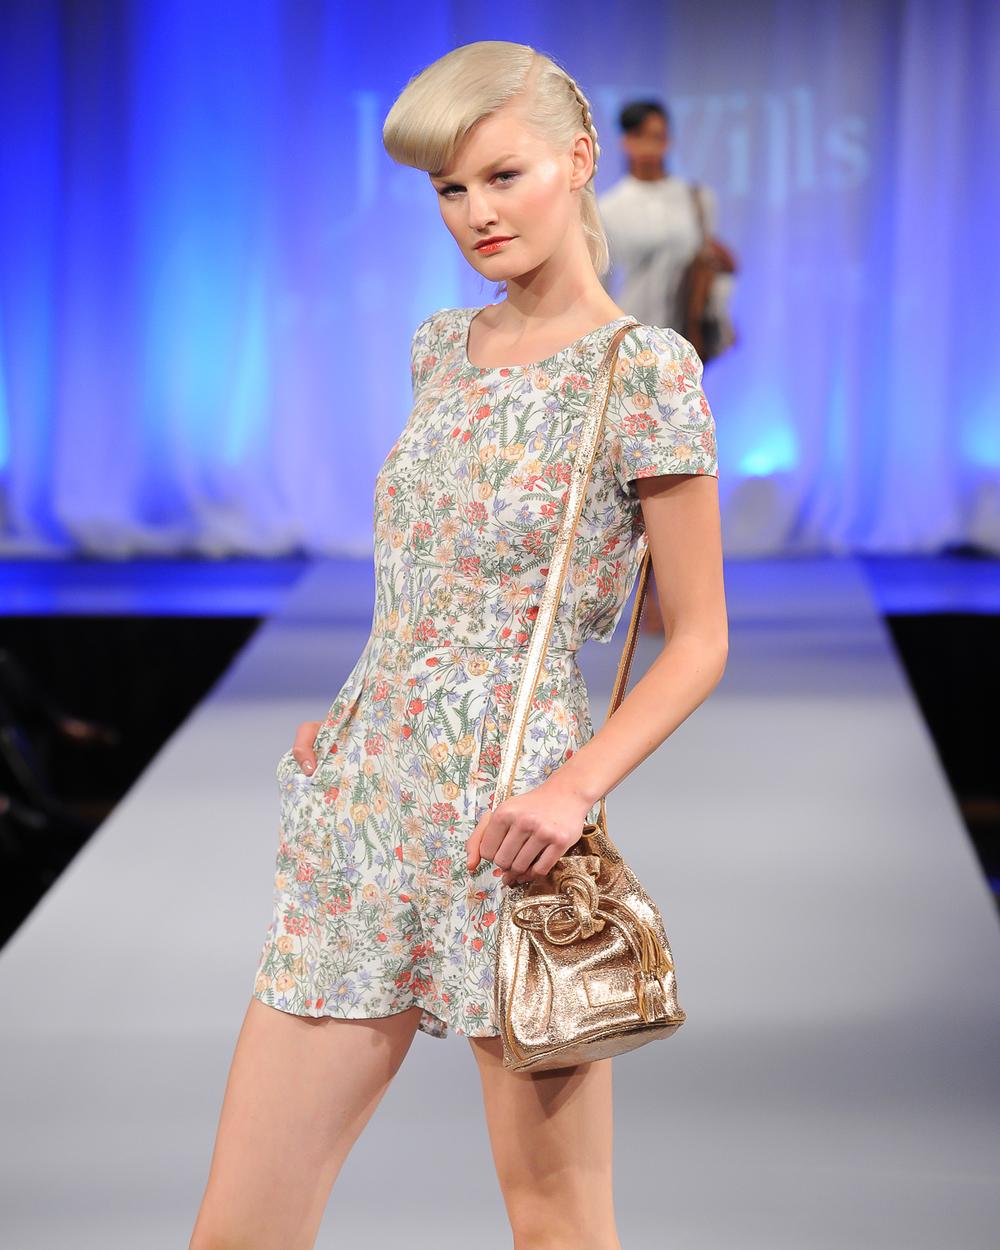 bristol-fashion-photographer-4.jpg